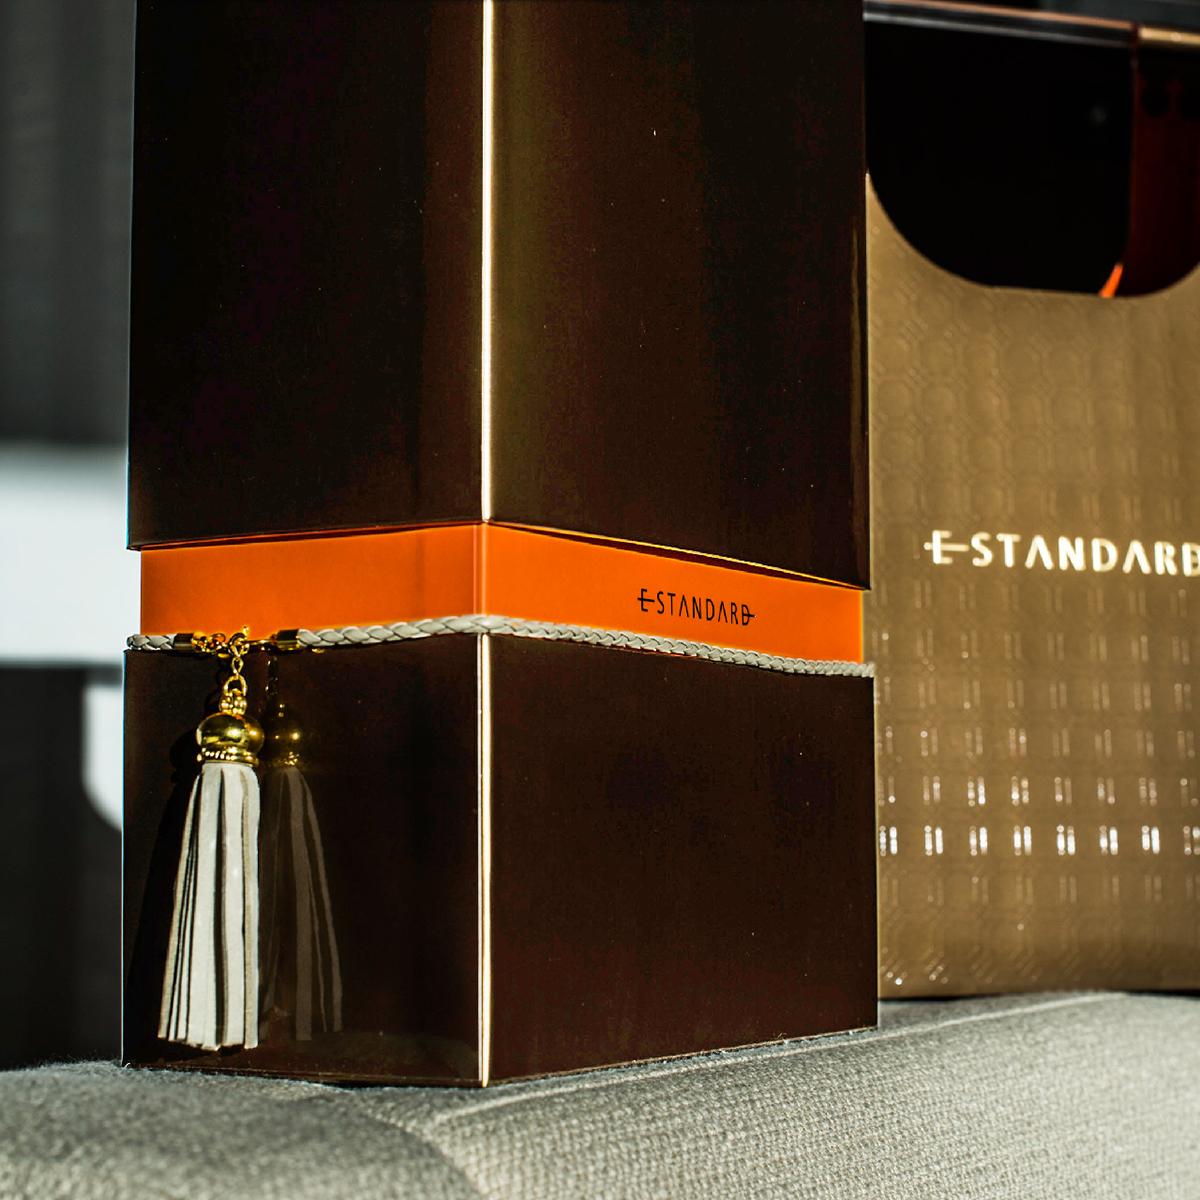 estandard16